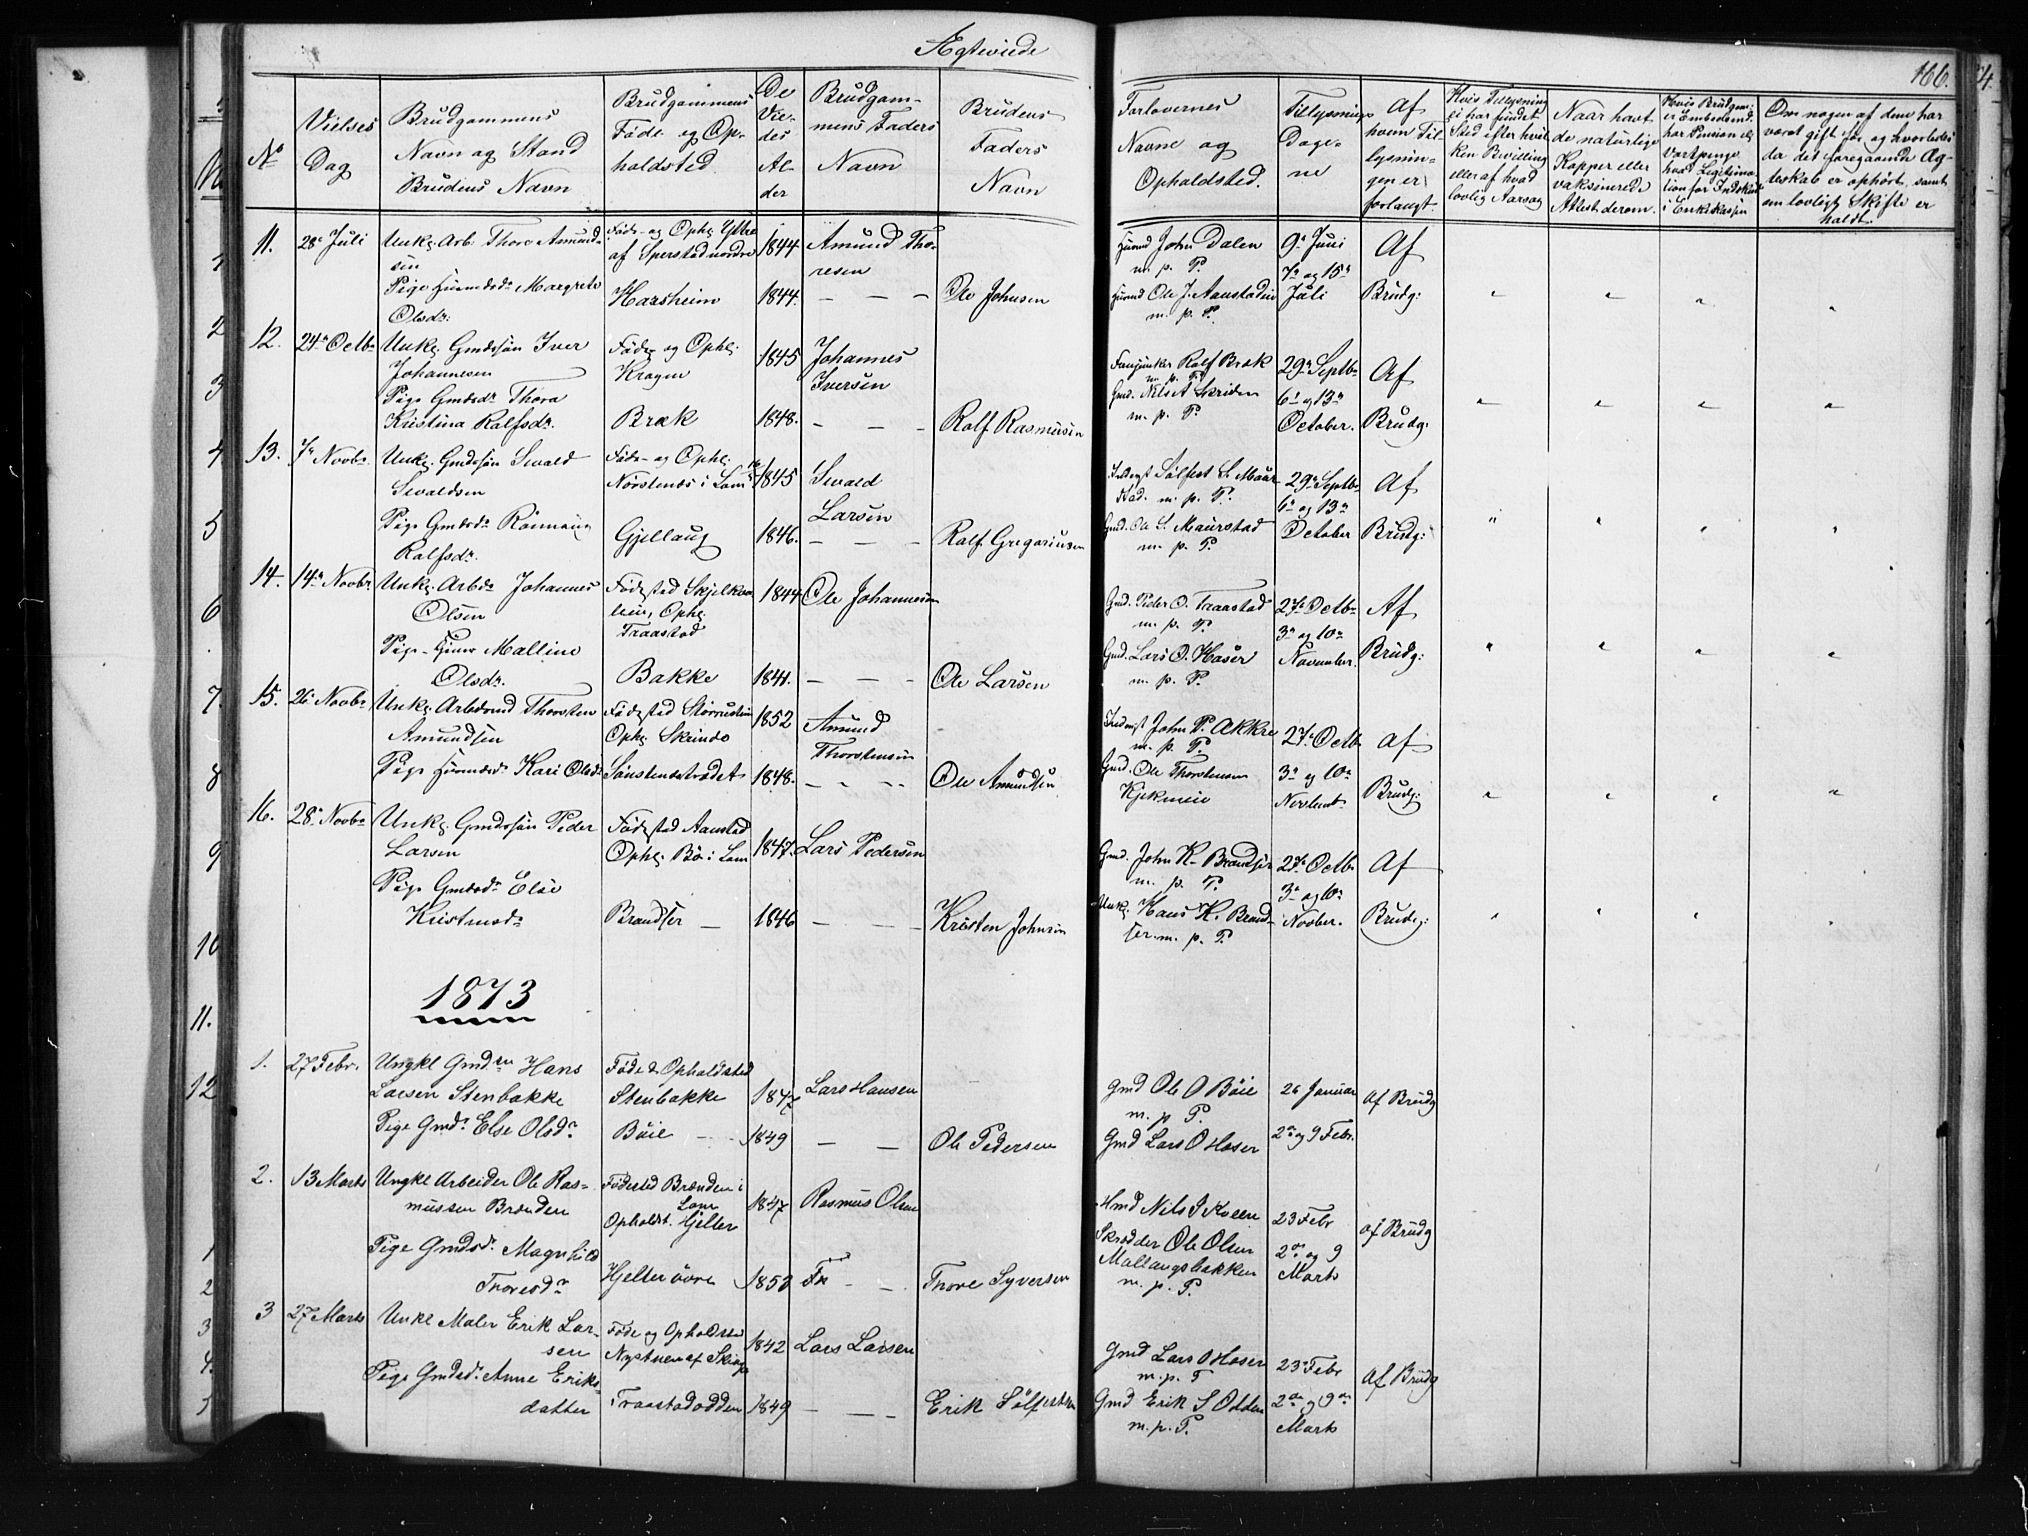 SAH, Skjåk prestekontor, Klokkerbok nr. 1, 1865-1893, s. 166